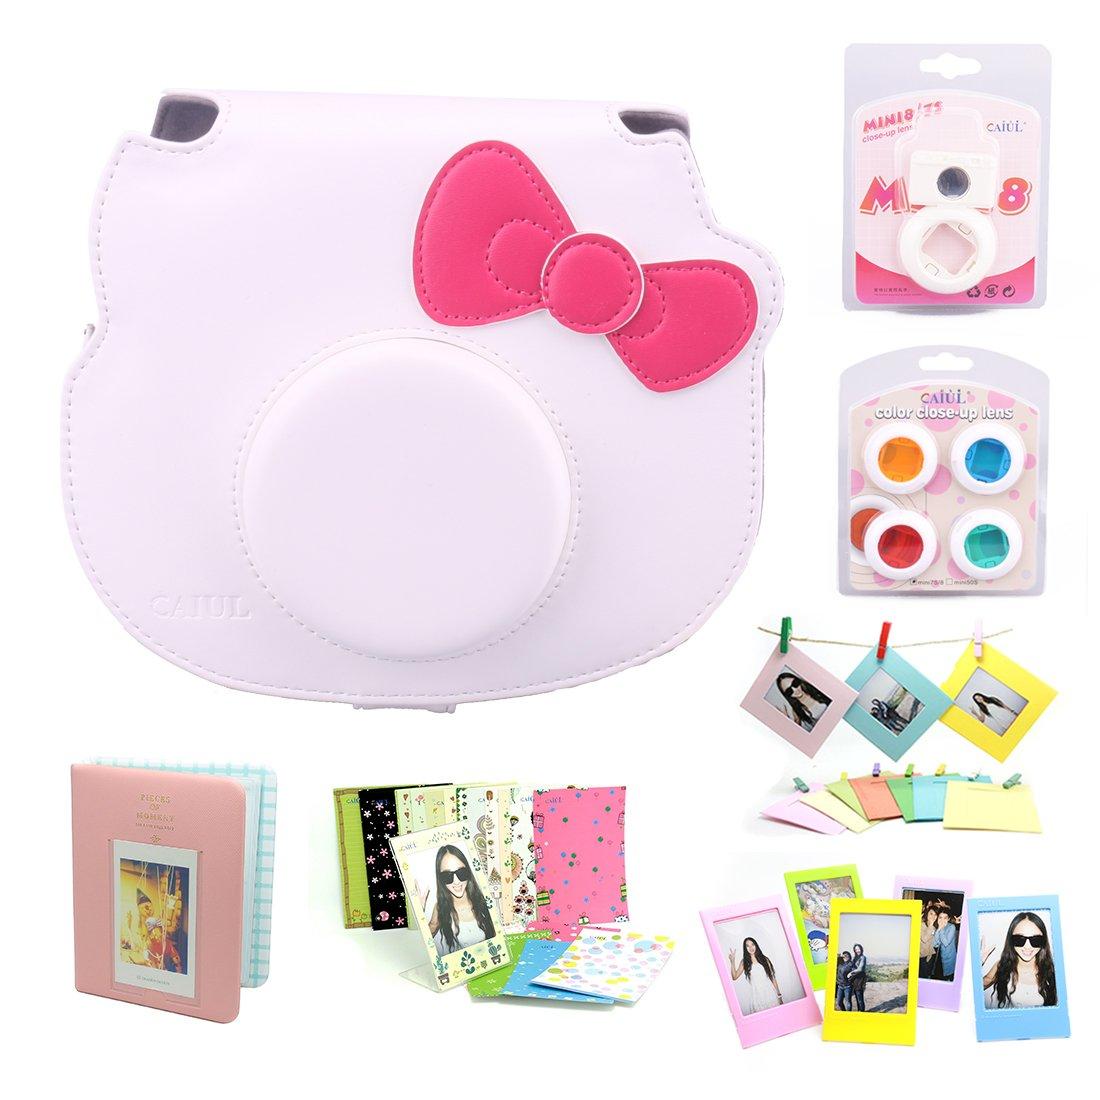 Amazon CAIUL 7 In 1 Hello Kitty Camera Accessories BundleWhite Case Mini Album Close Up Selfie Lens 4 Colors Wall Hang